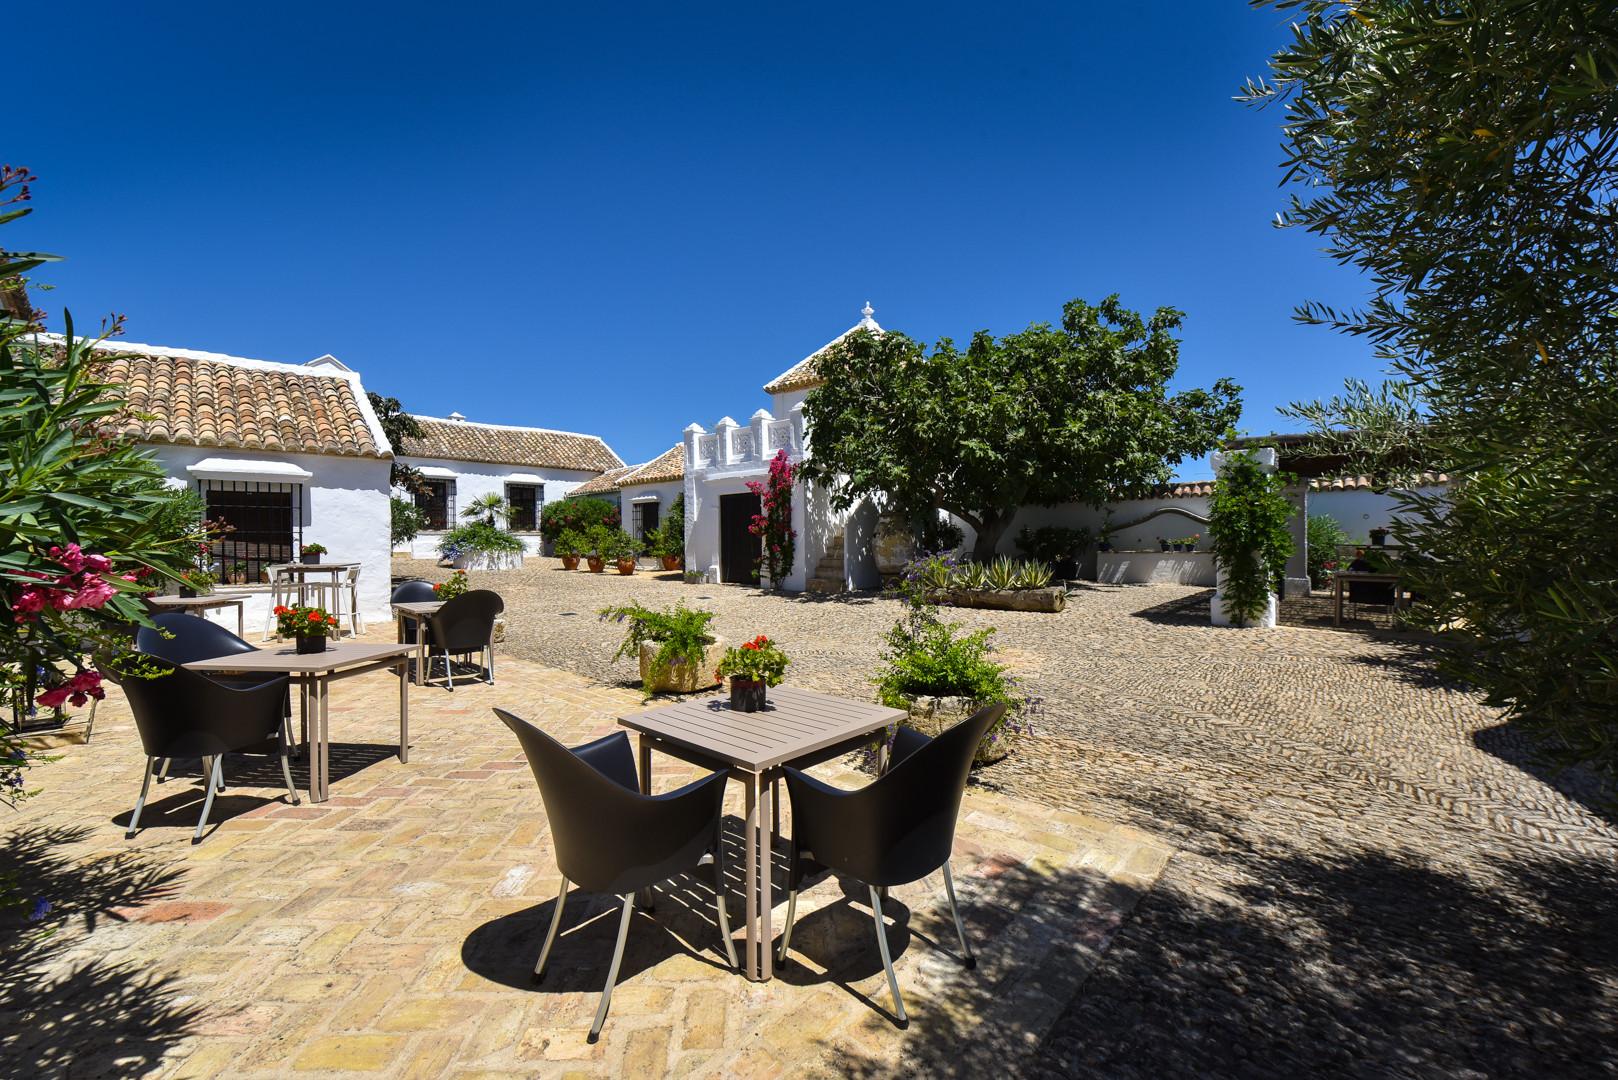 Andalusian courtyard, Ronda